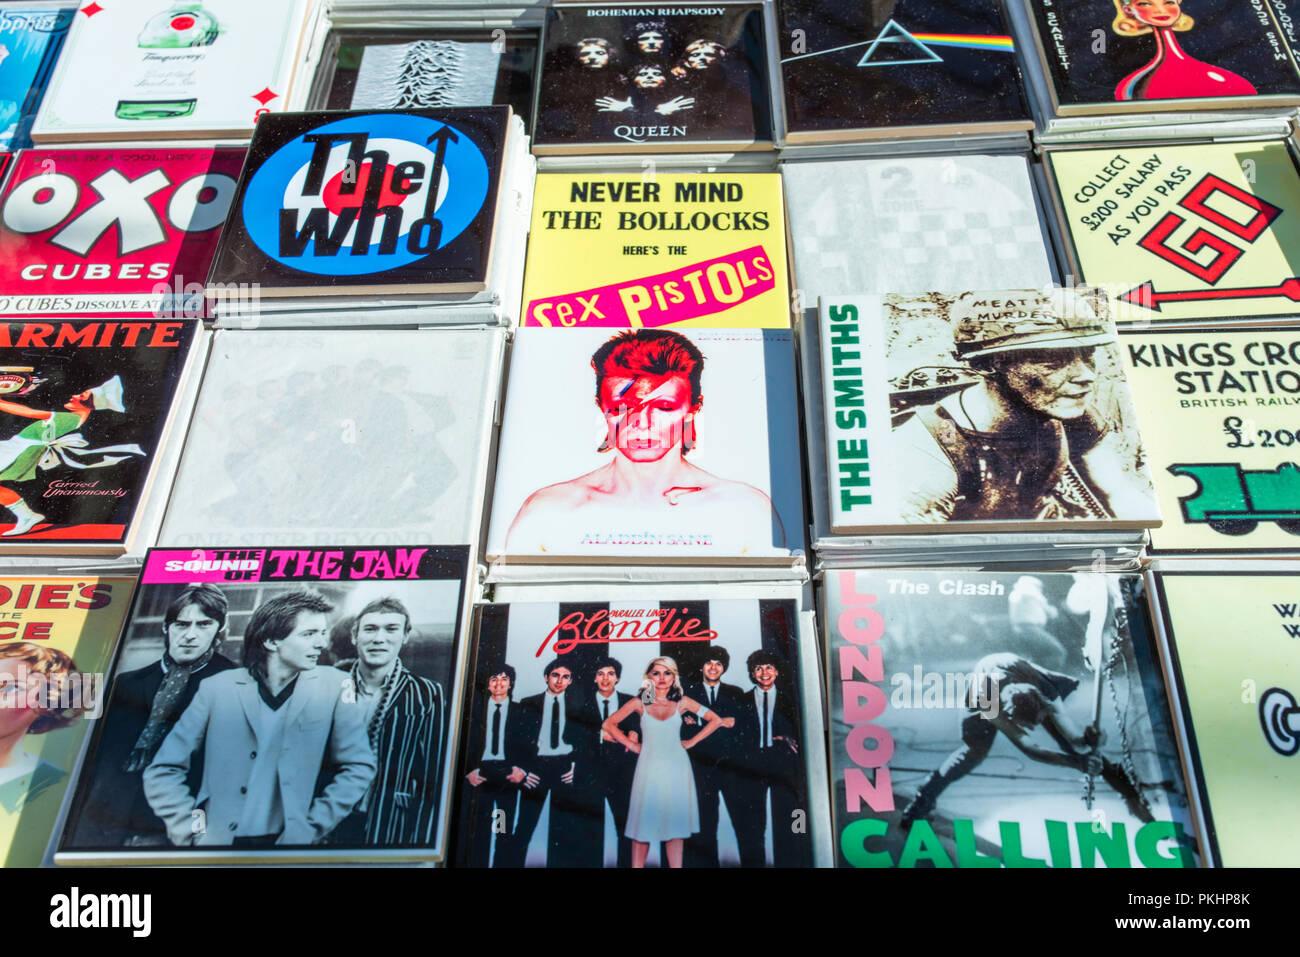 Album Covers Stock Photos Amp Album Covers Stock Images Alamy